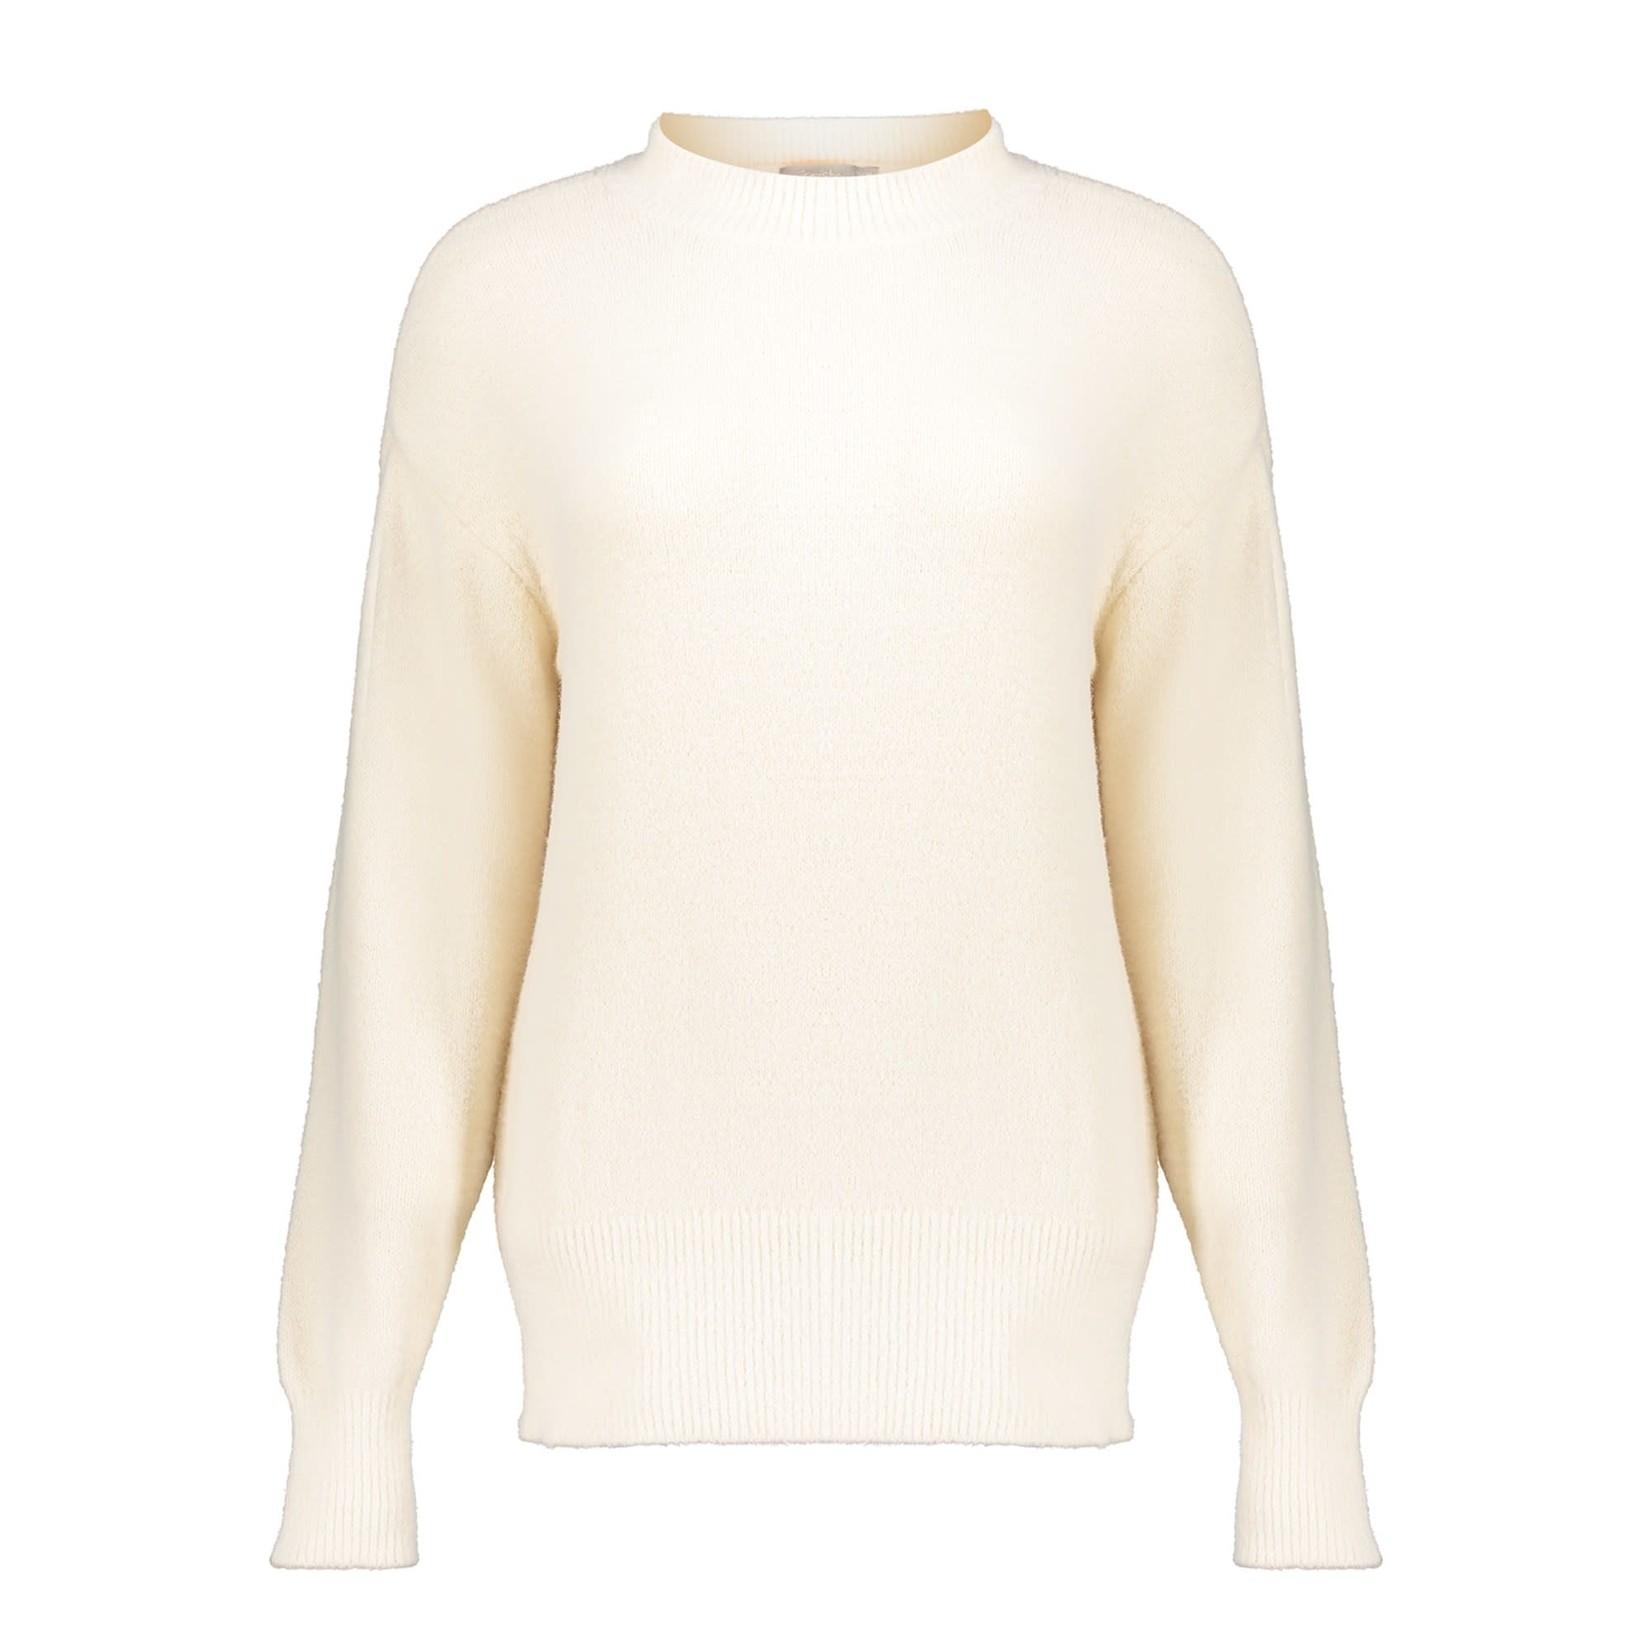 Geisha Geisha Fluffy pullover cream 14545-29